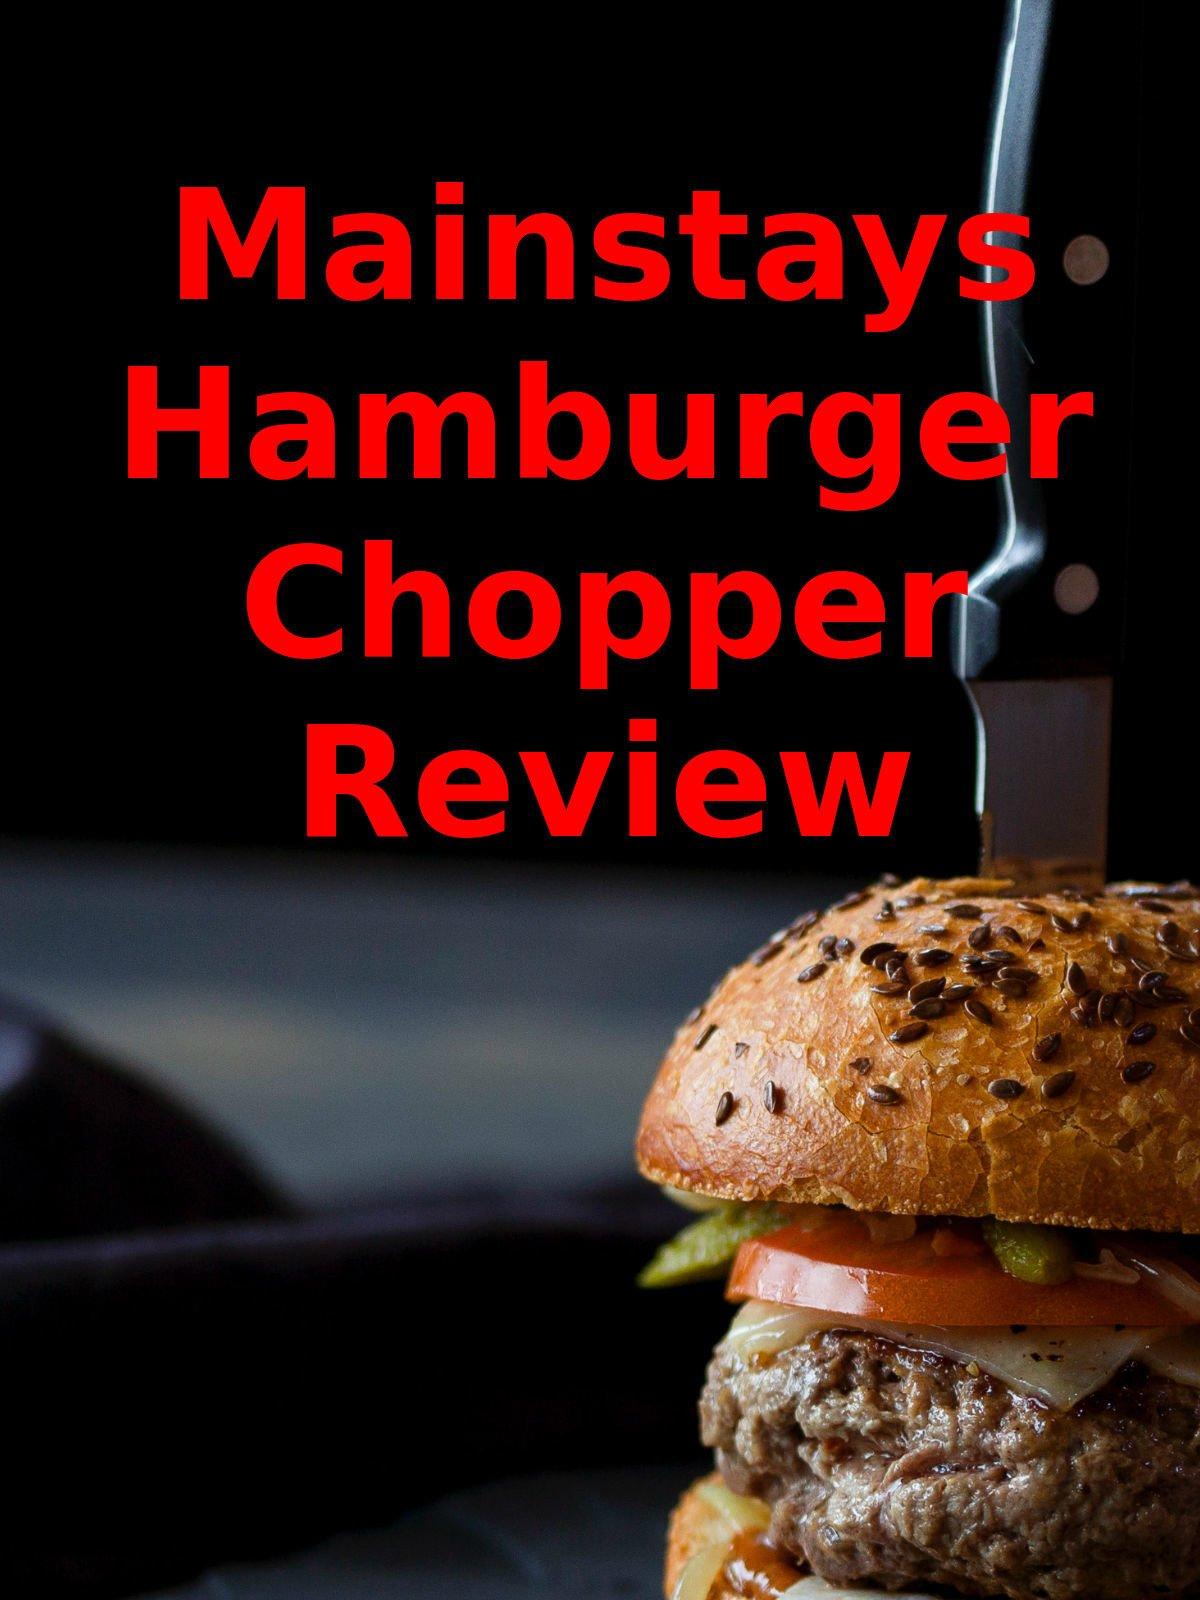 Review: Mainstays Hamburger Chopper Review